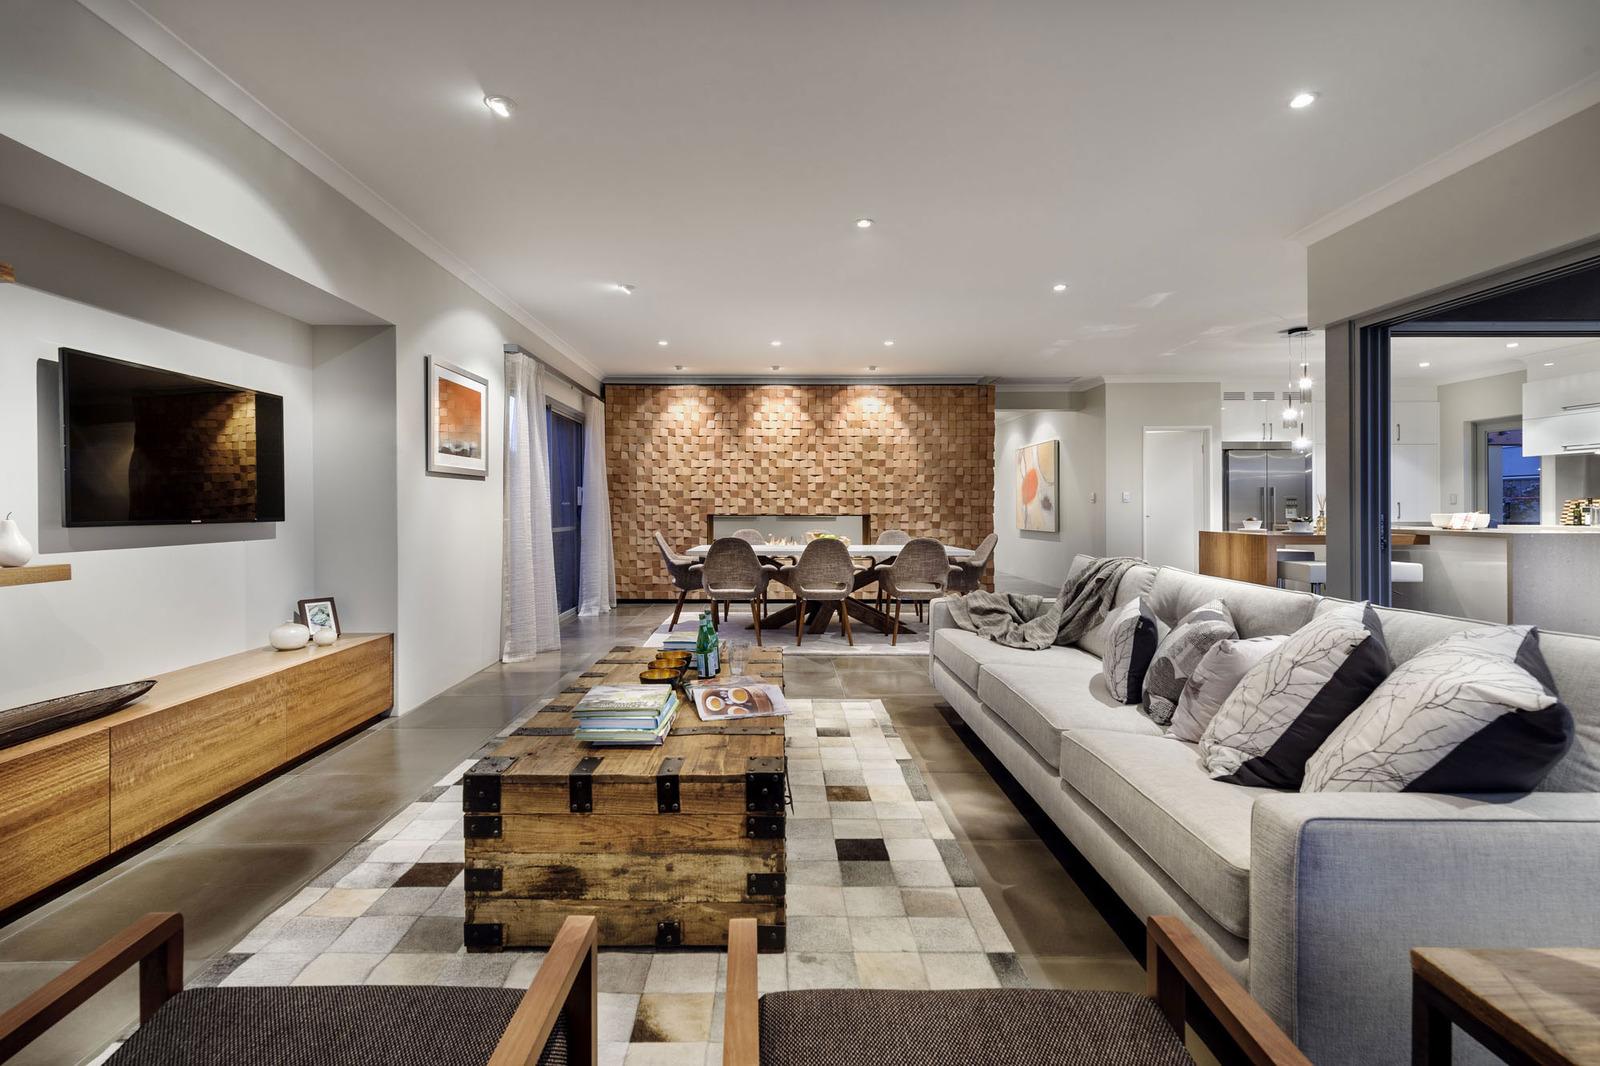 Super Cozy Elegant Home Combines Craftsmanship With Rustic